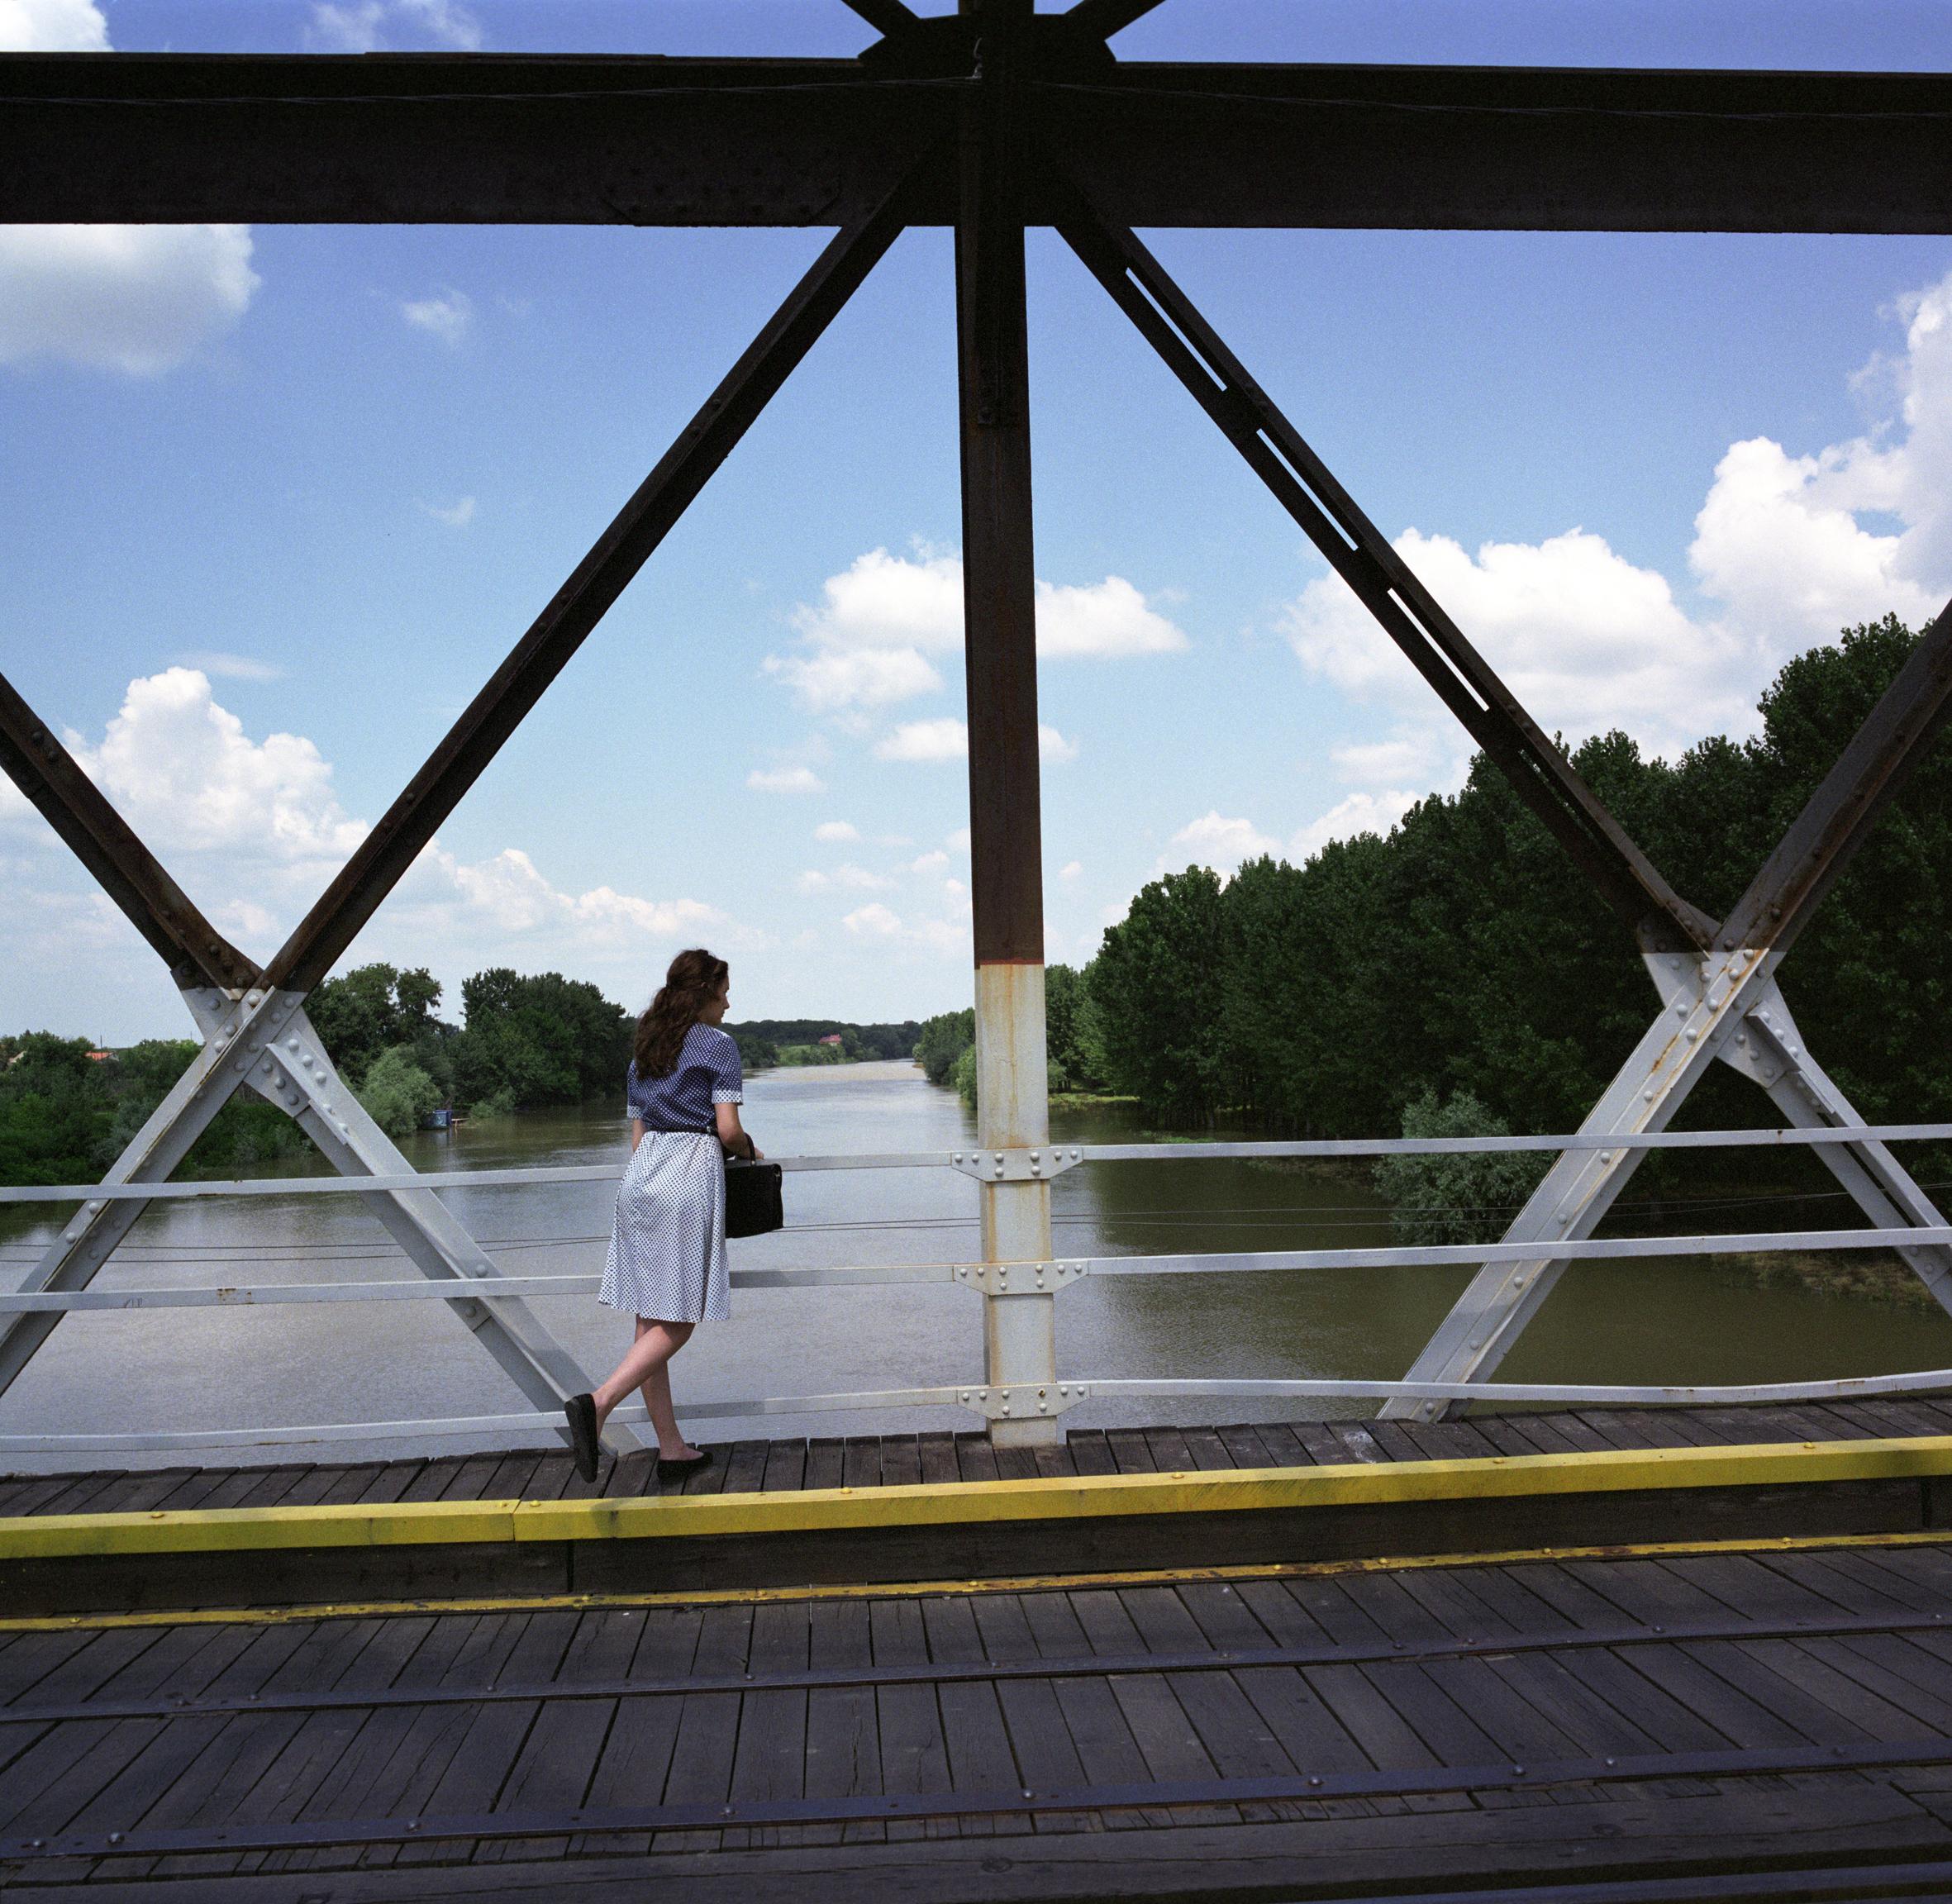 The Girl on th Bridge